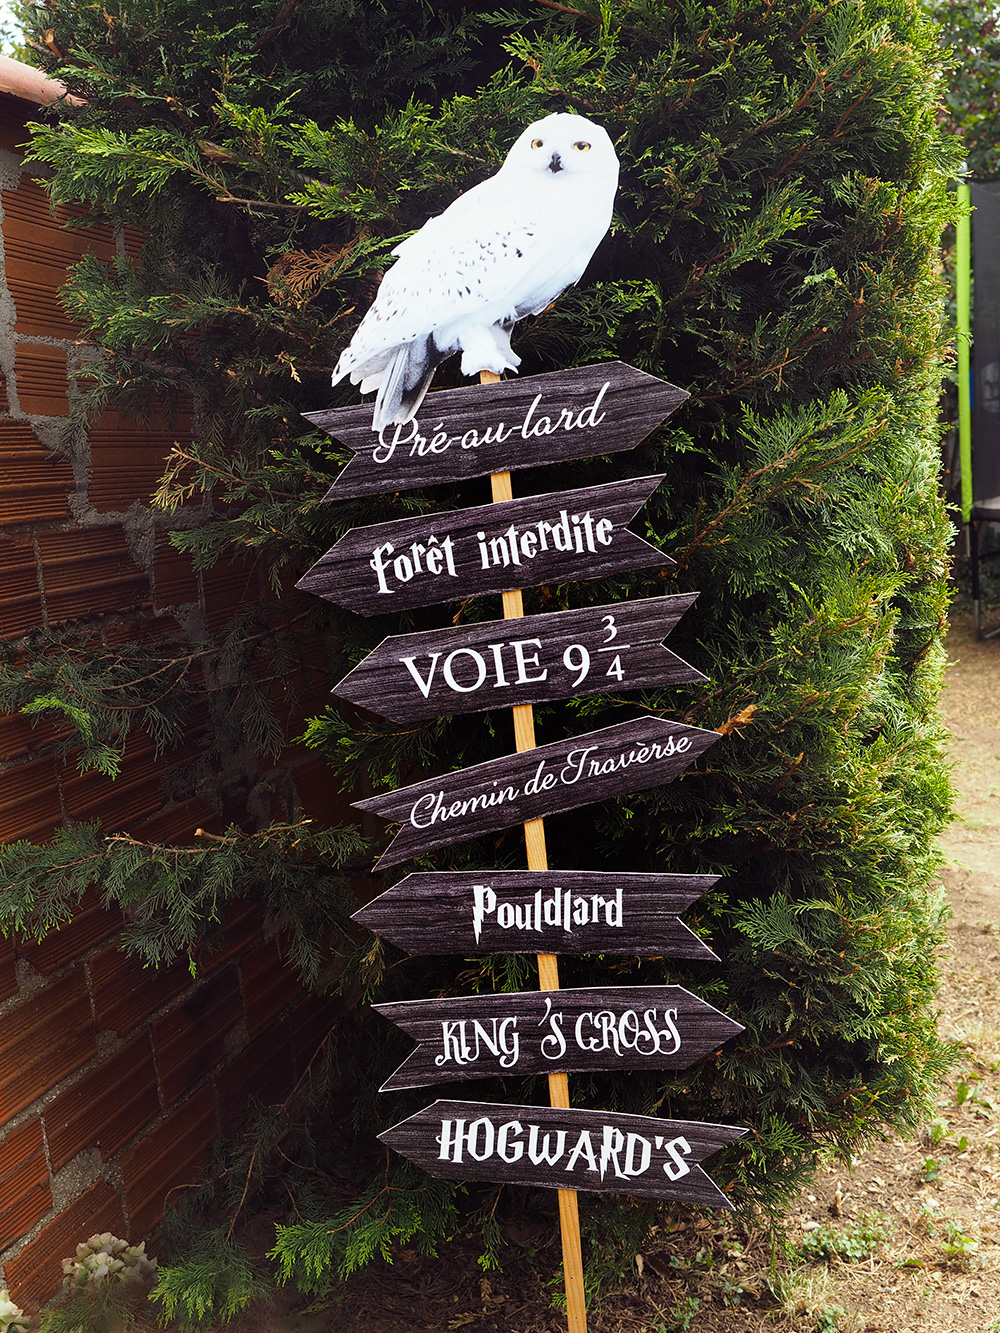 Organiser Une Fête Harry Potter Minireyveminireyve